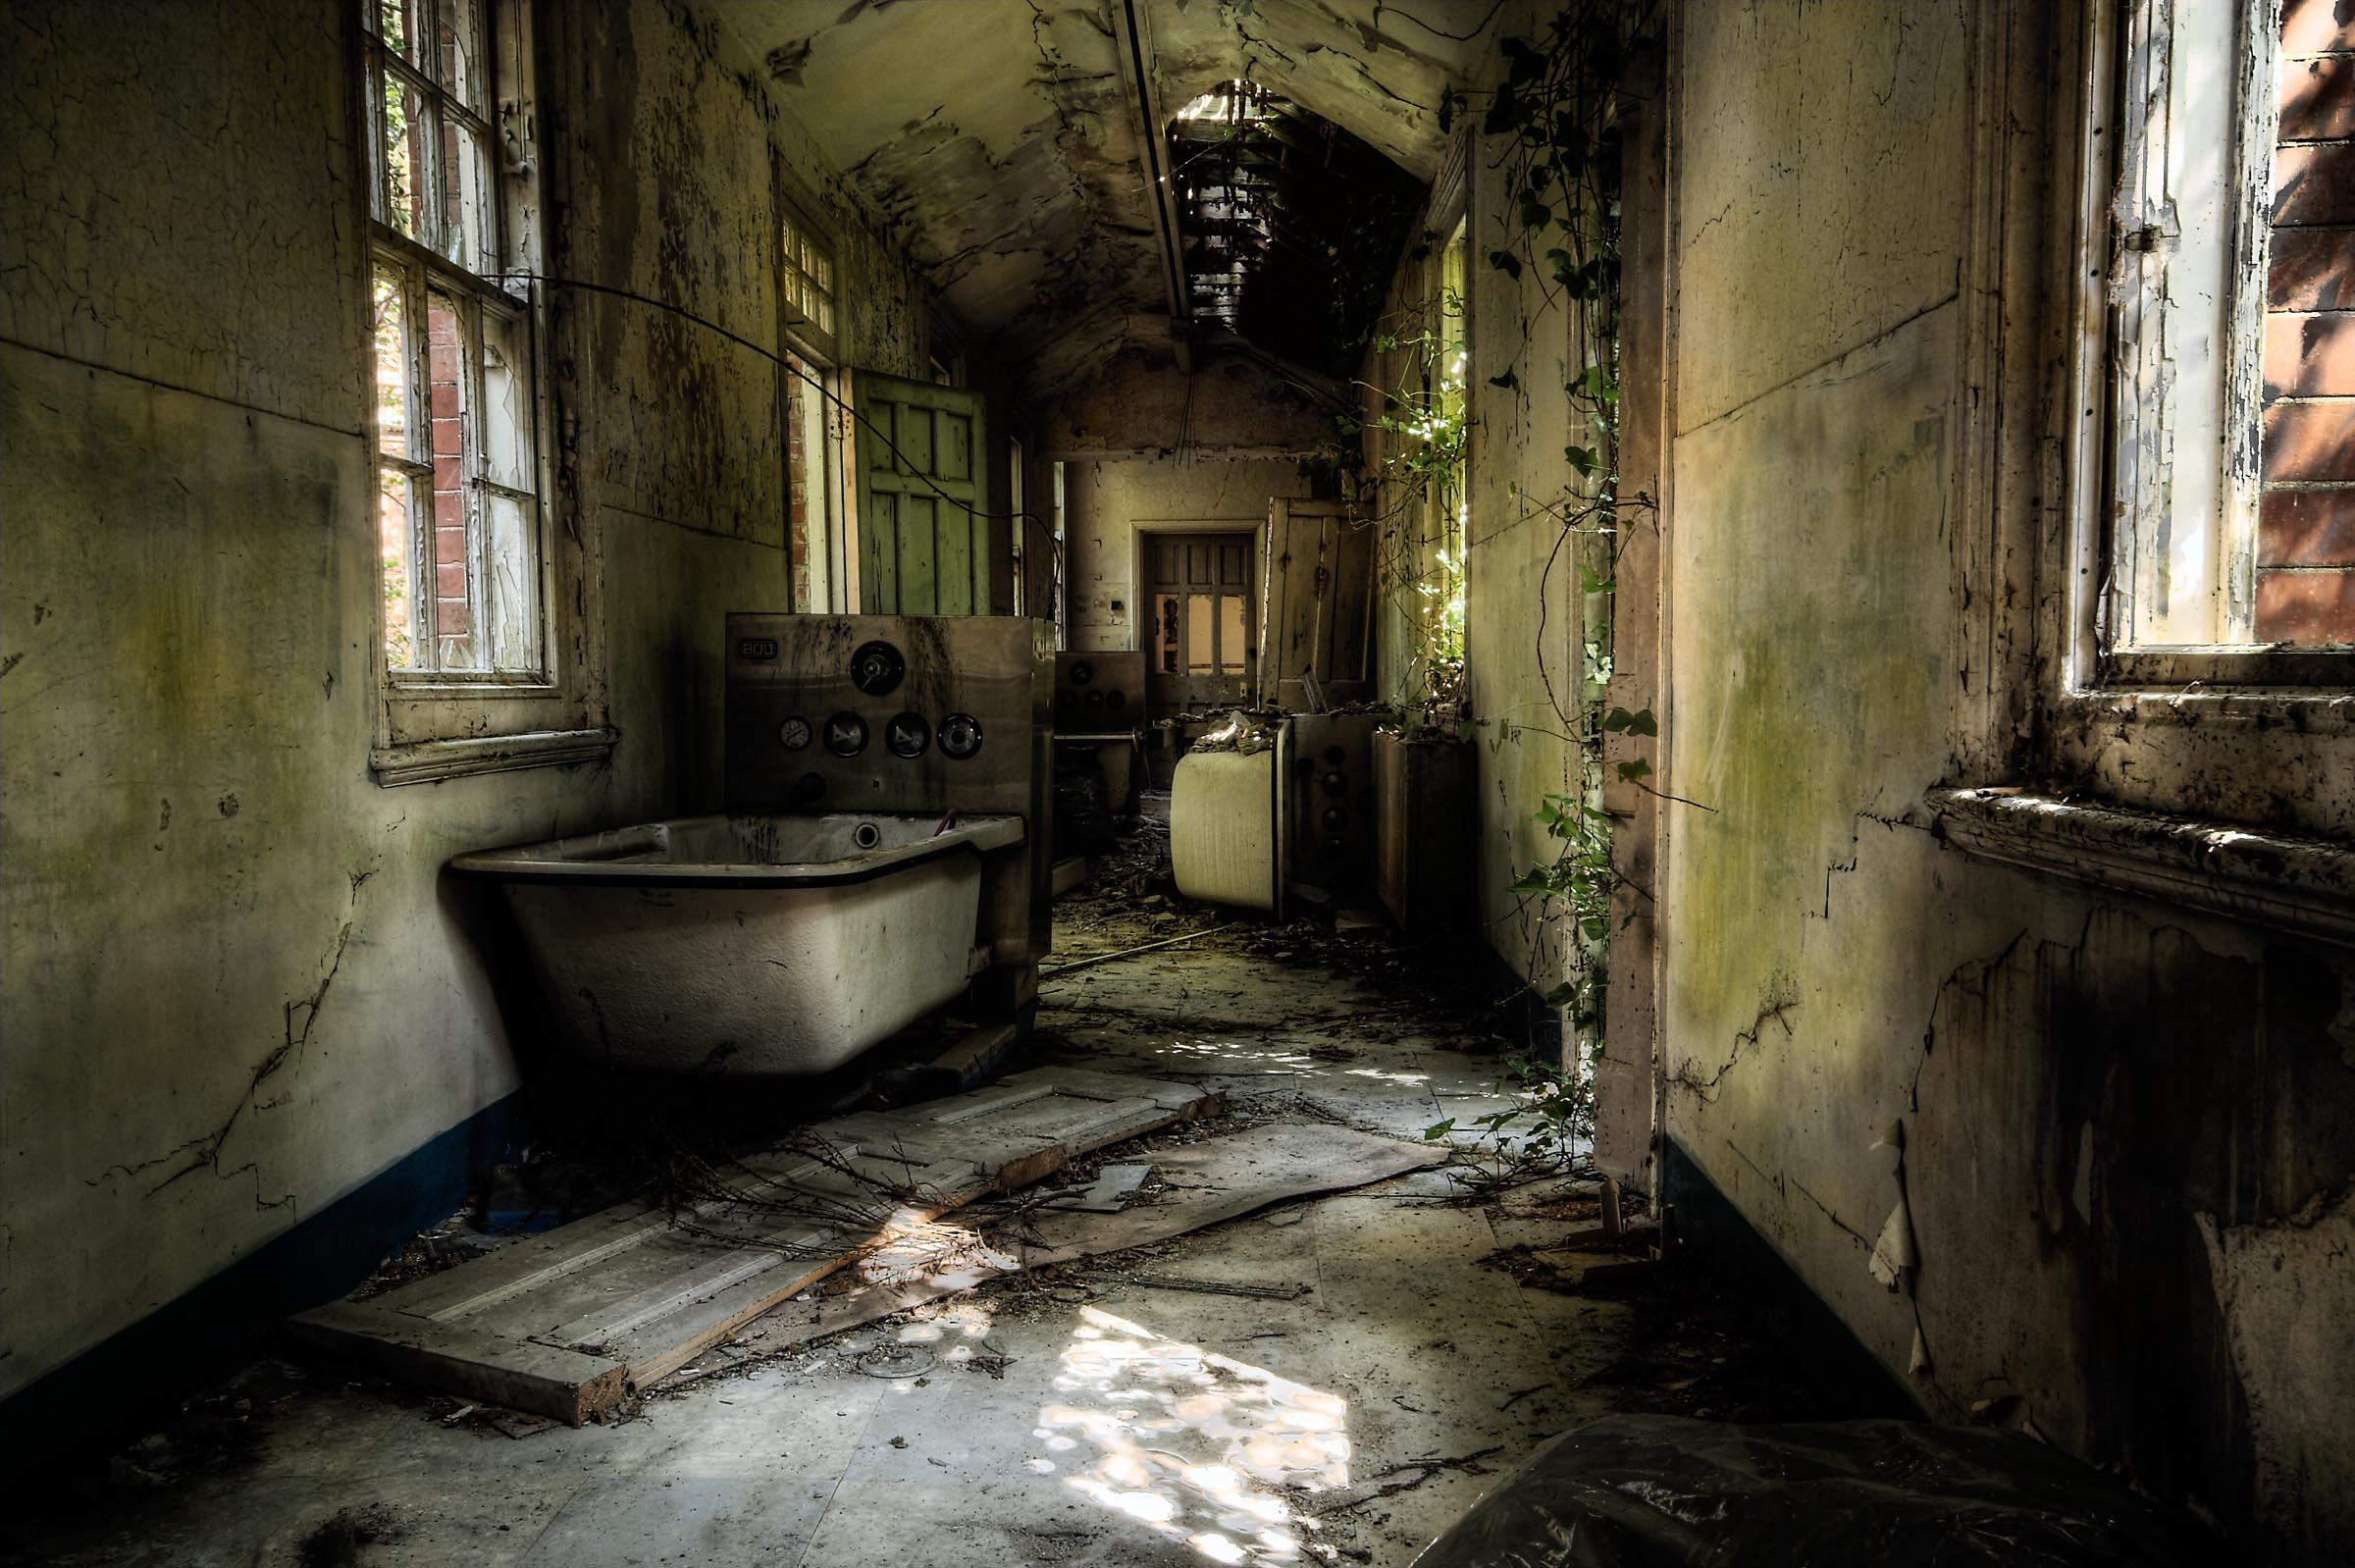 Hellingly Hospital - L'ospedale Psichiatrico fantasma, Inghilterra